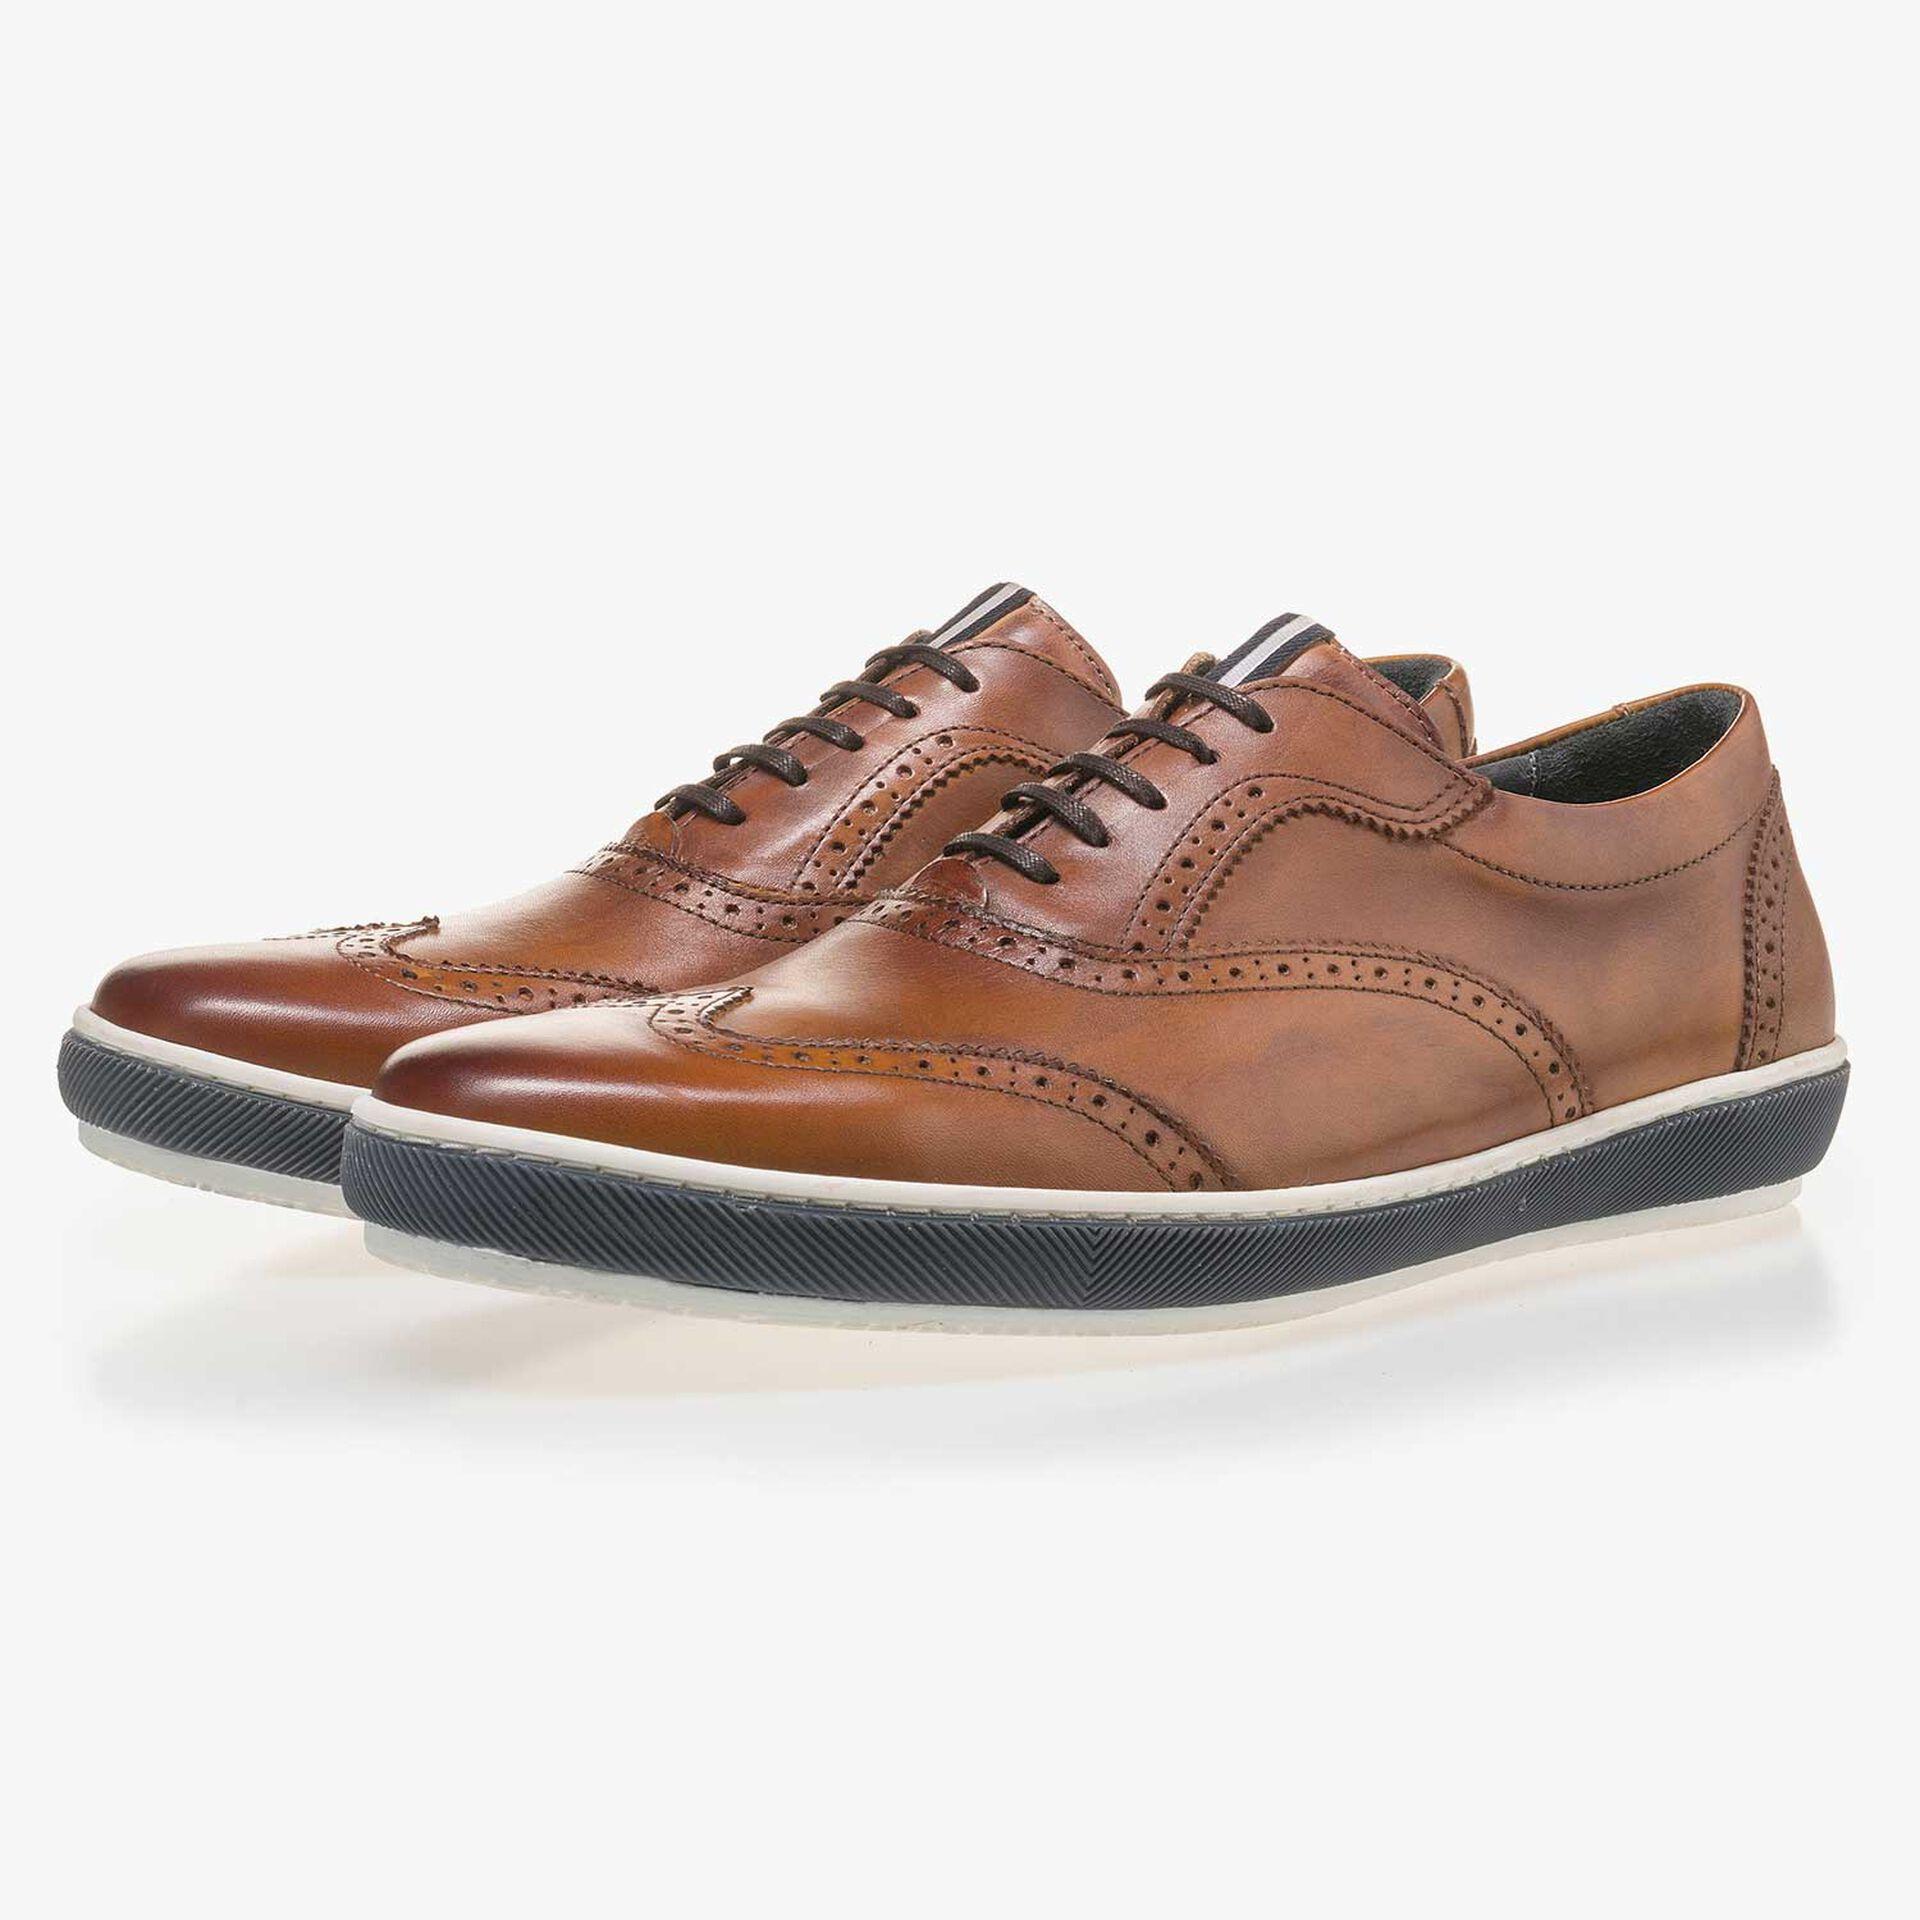 Cognac-coloured calf leather brogue shoe